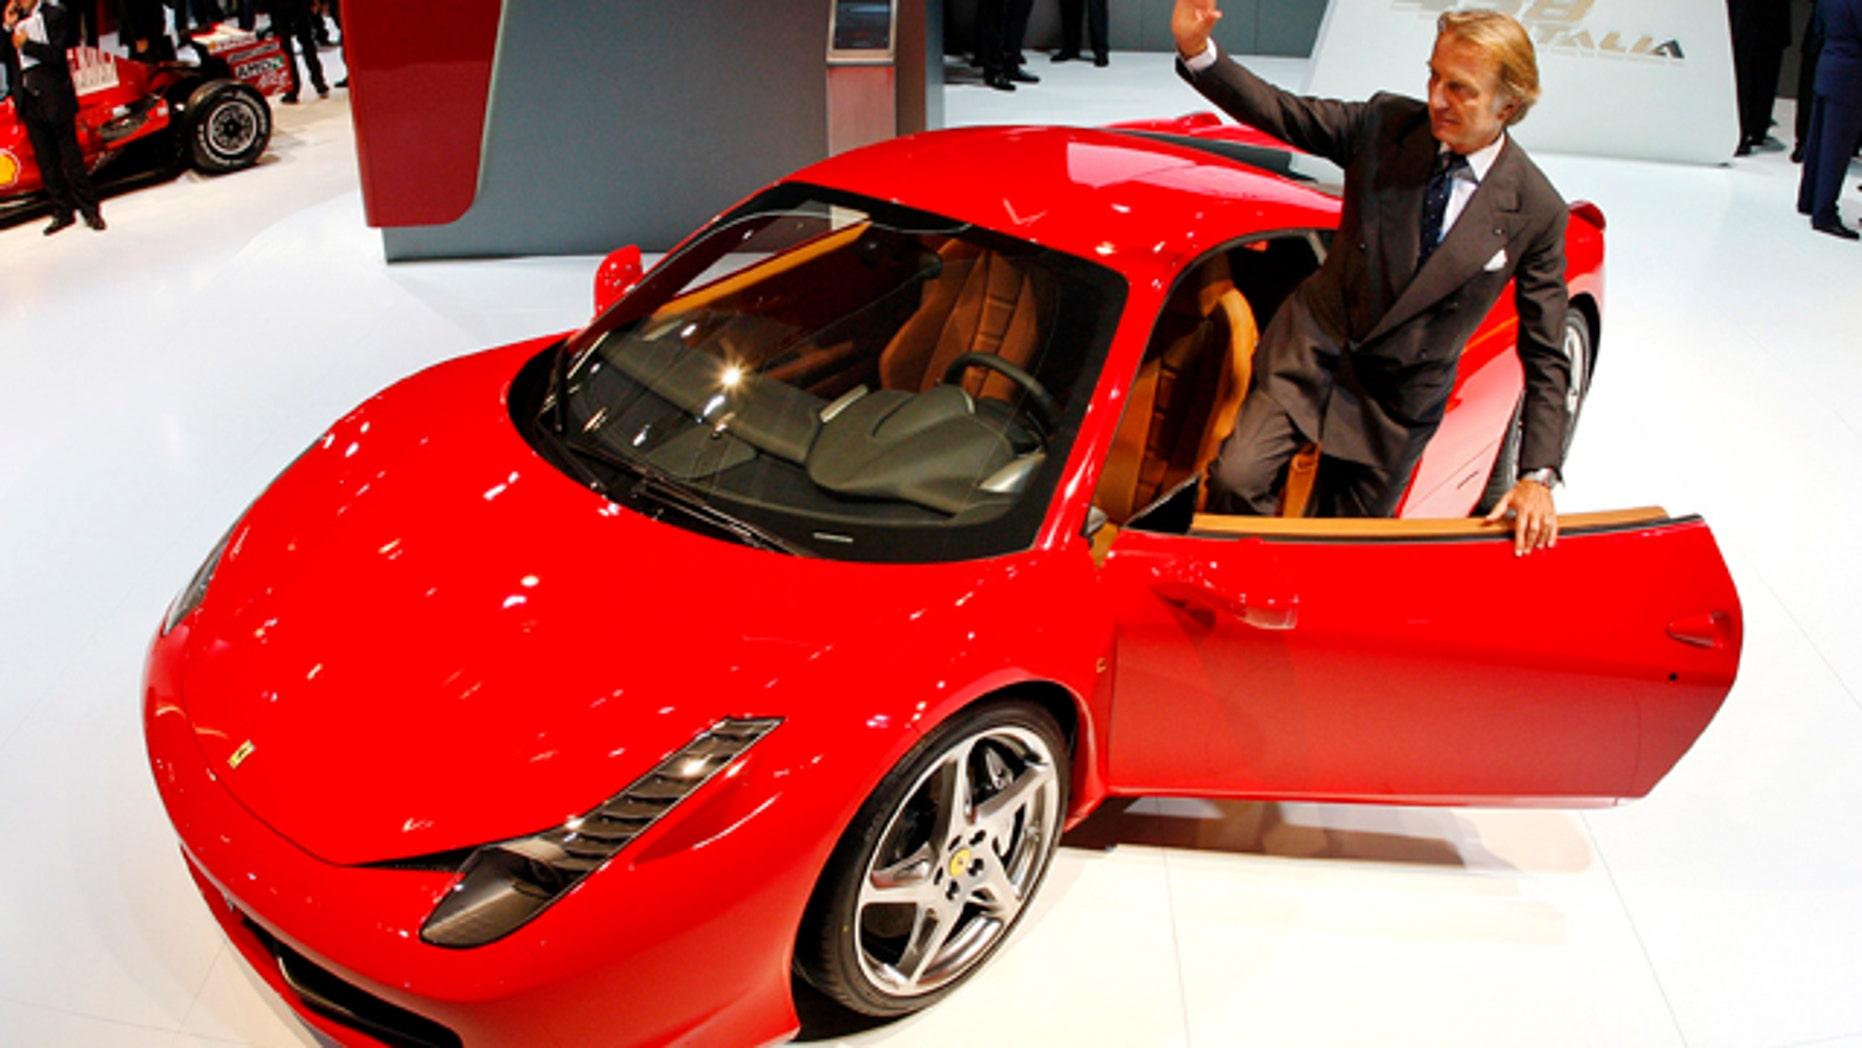 President of Fiat group Luca di Montezemolo stands next to a Ferrari 458 Italia